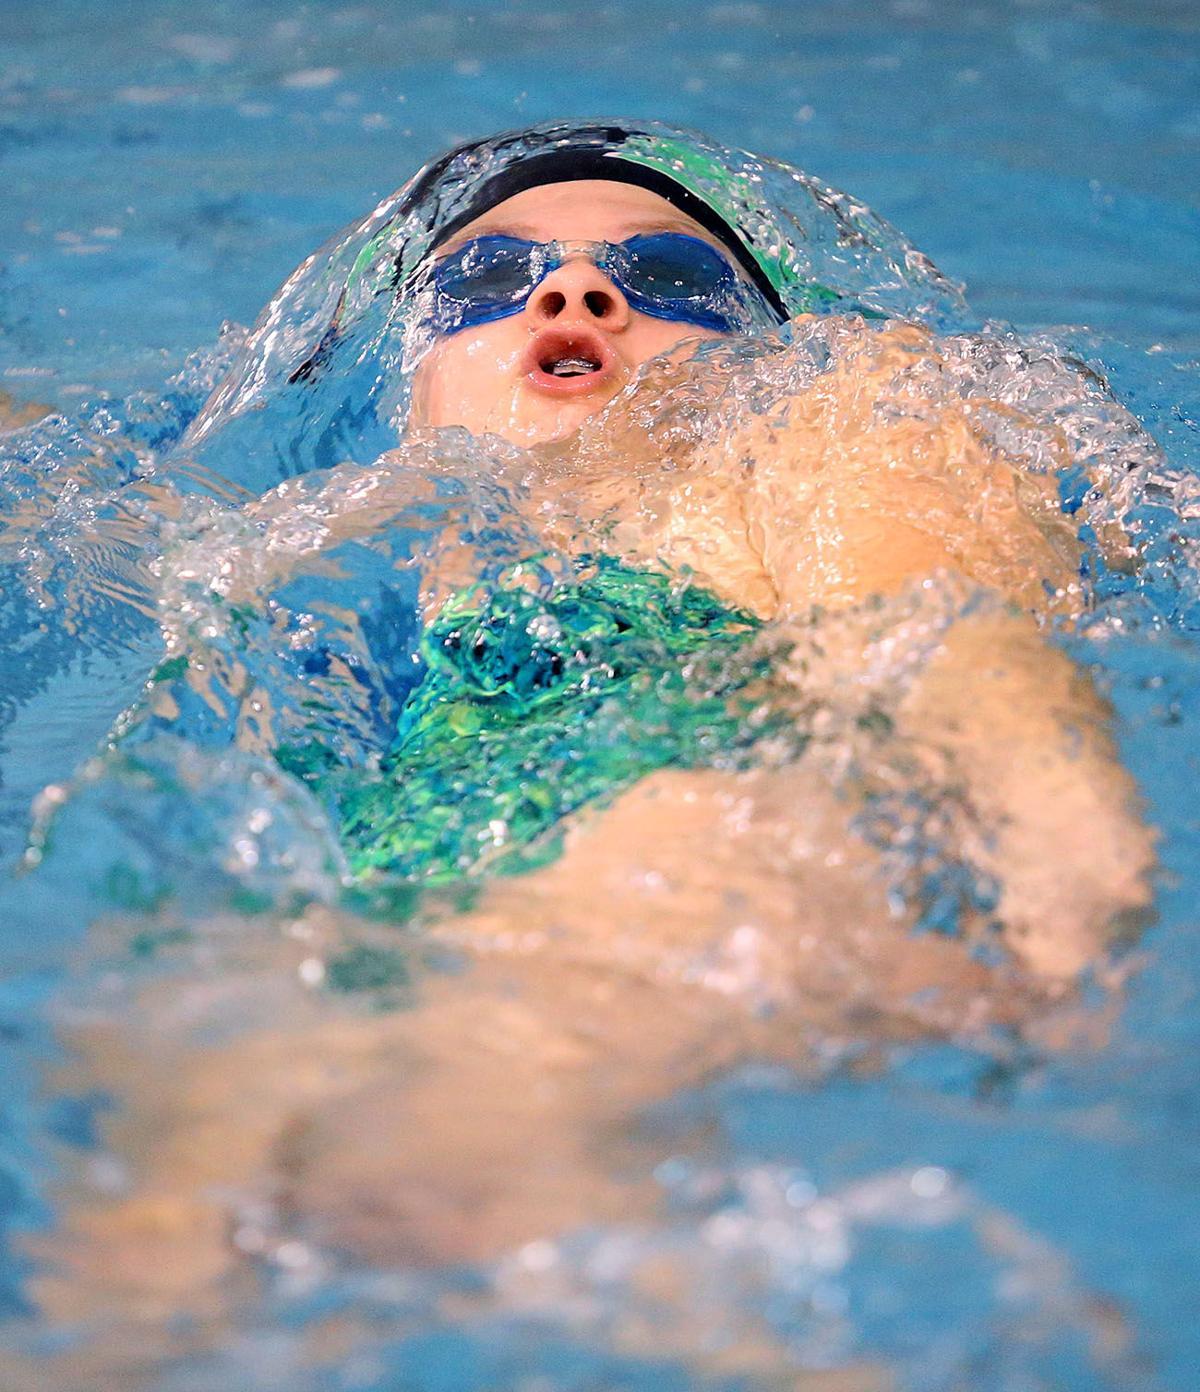 EHS vs Cass swimming 01.jpg